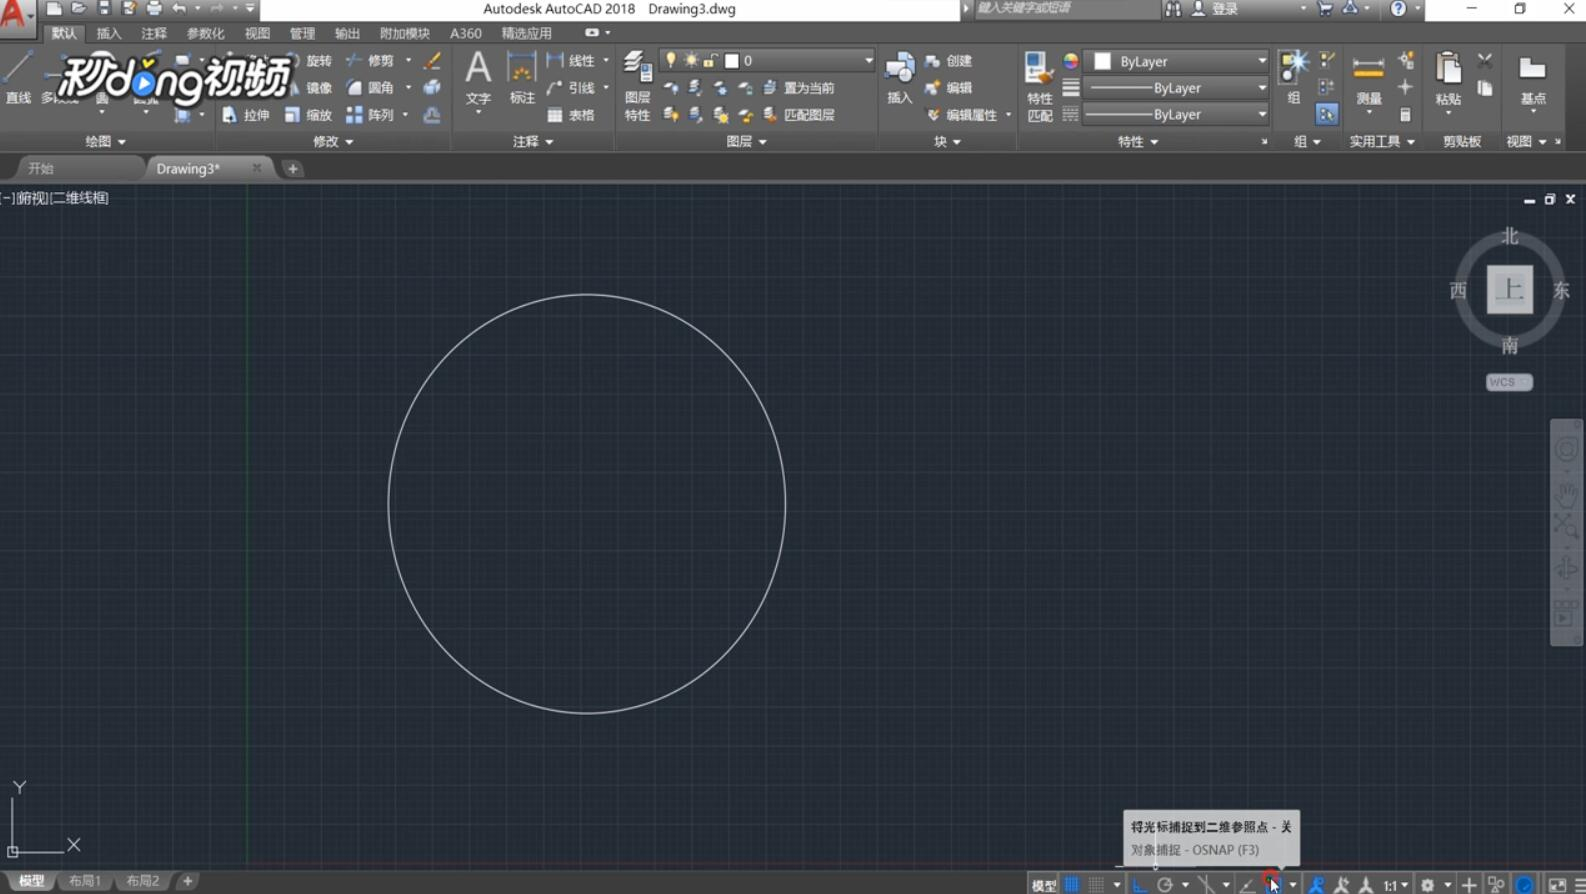 CAD画指北针?CAD指北针制作方法ppt如cad公差图纸标注图片